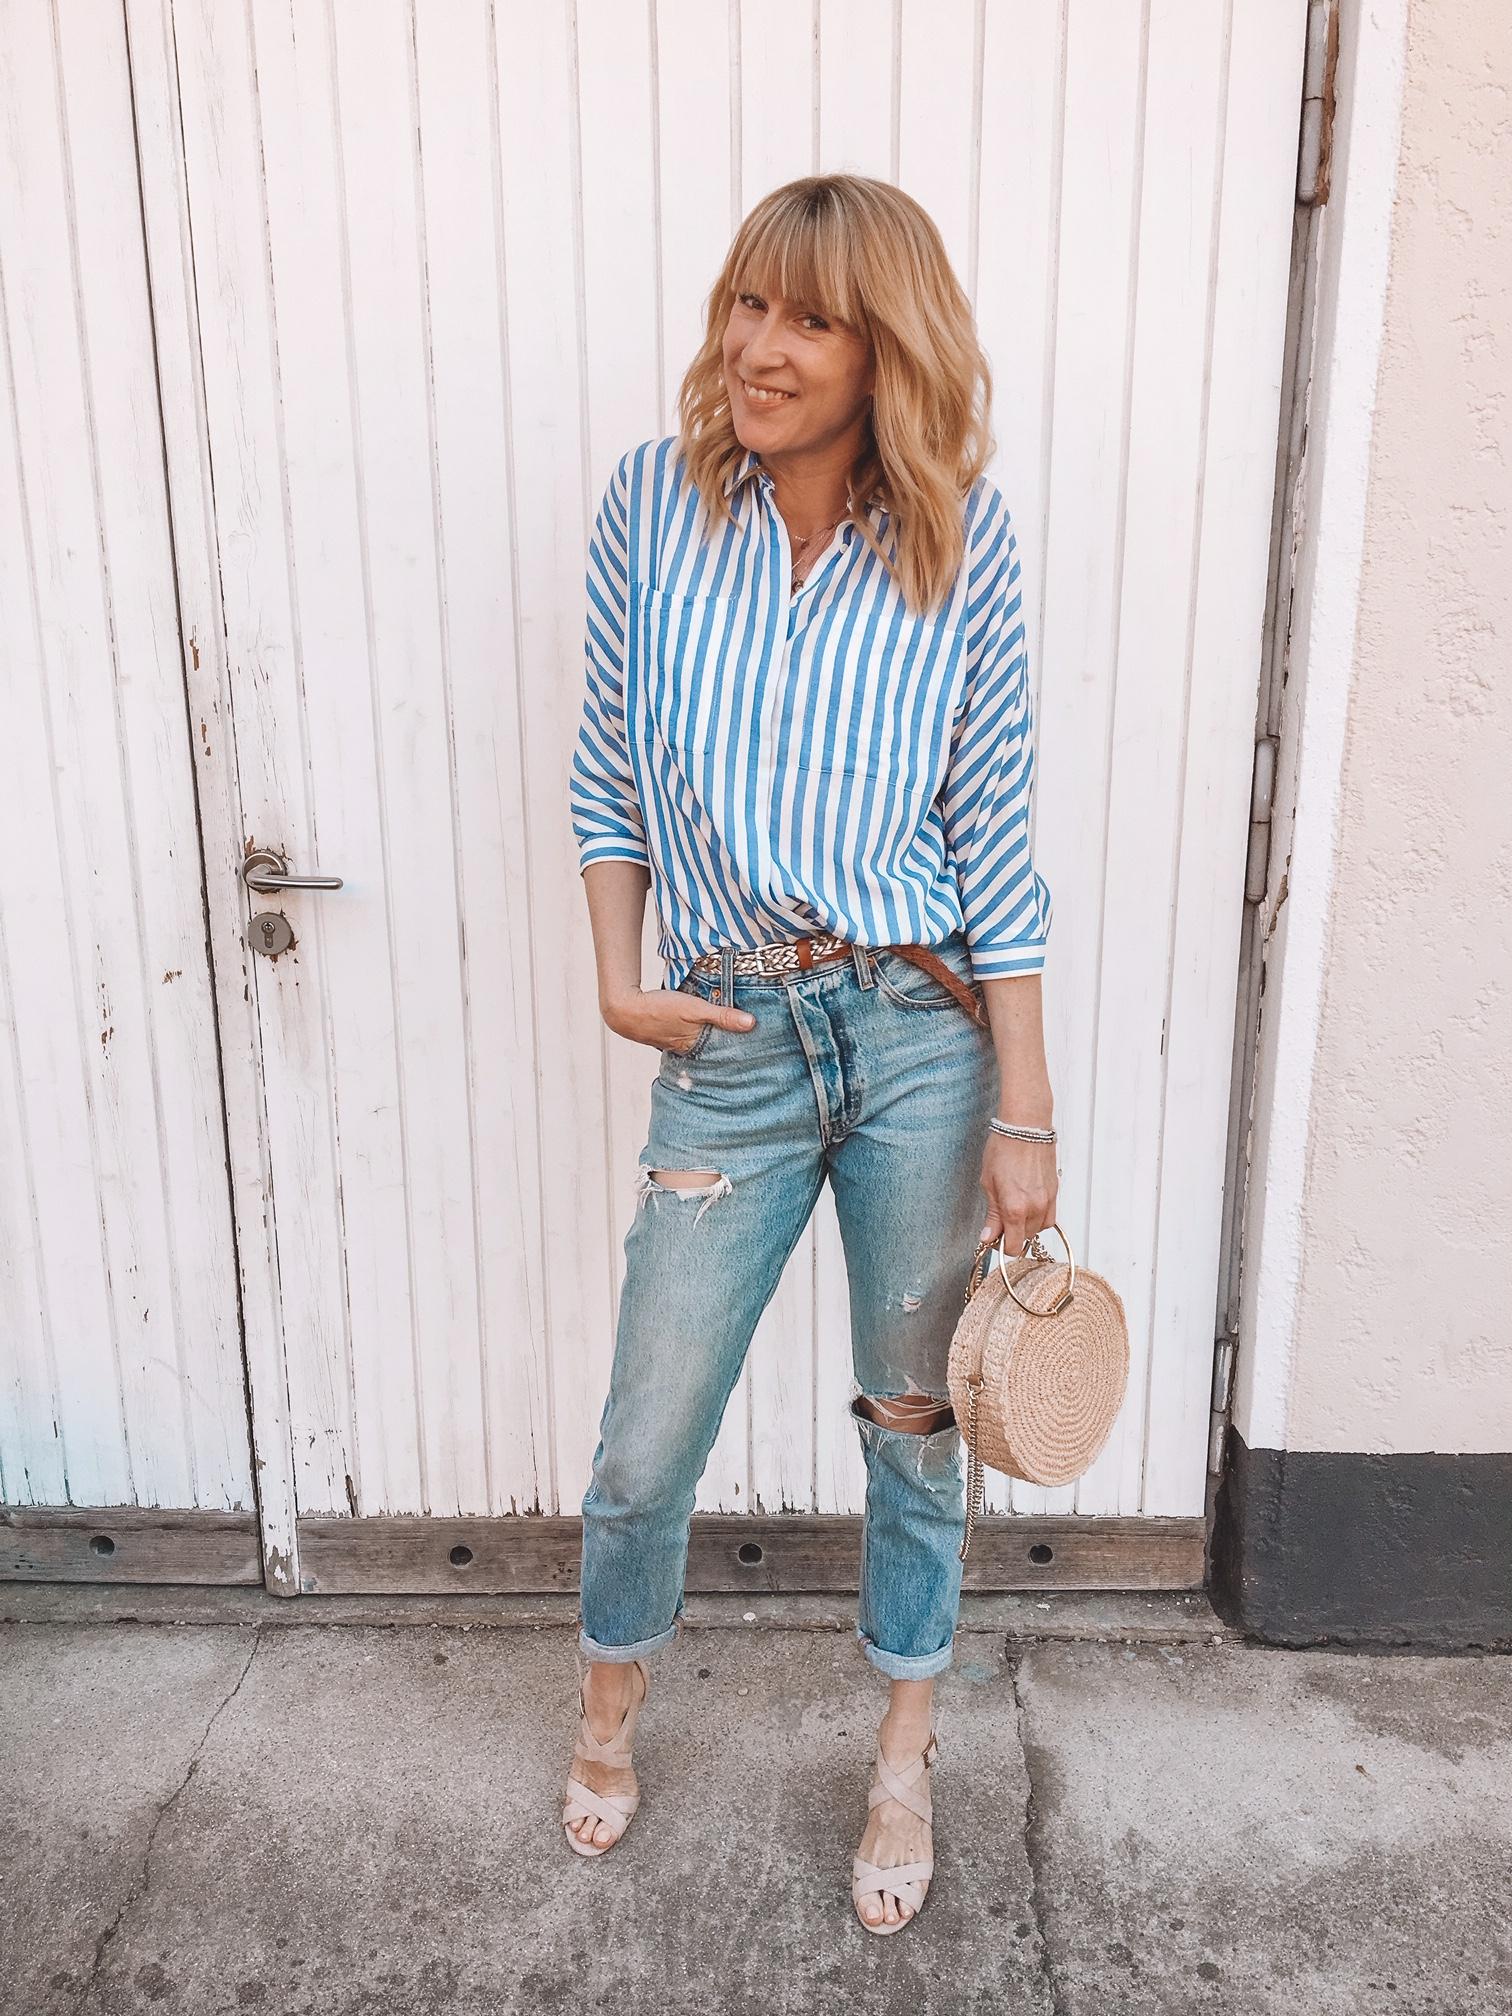 Frühlingstrends: filigrane Heels zu weiten Jeans